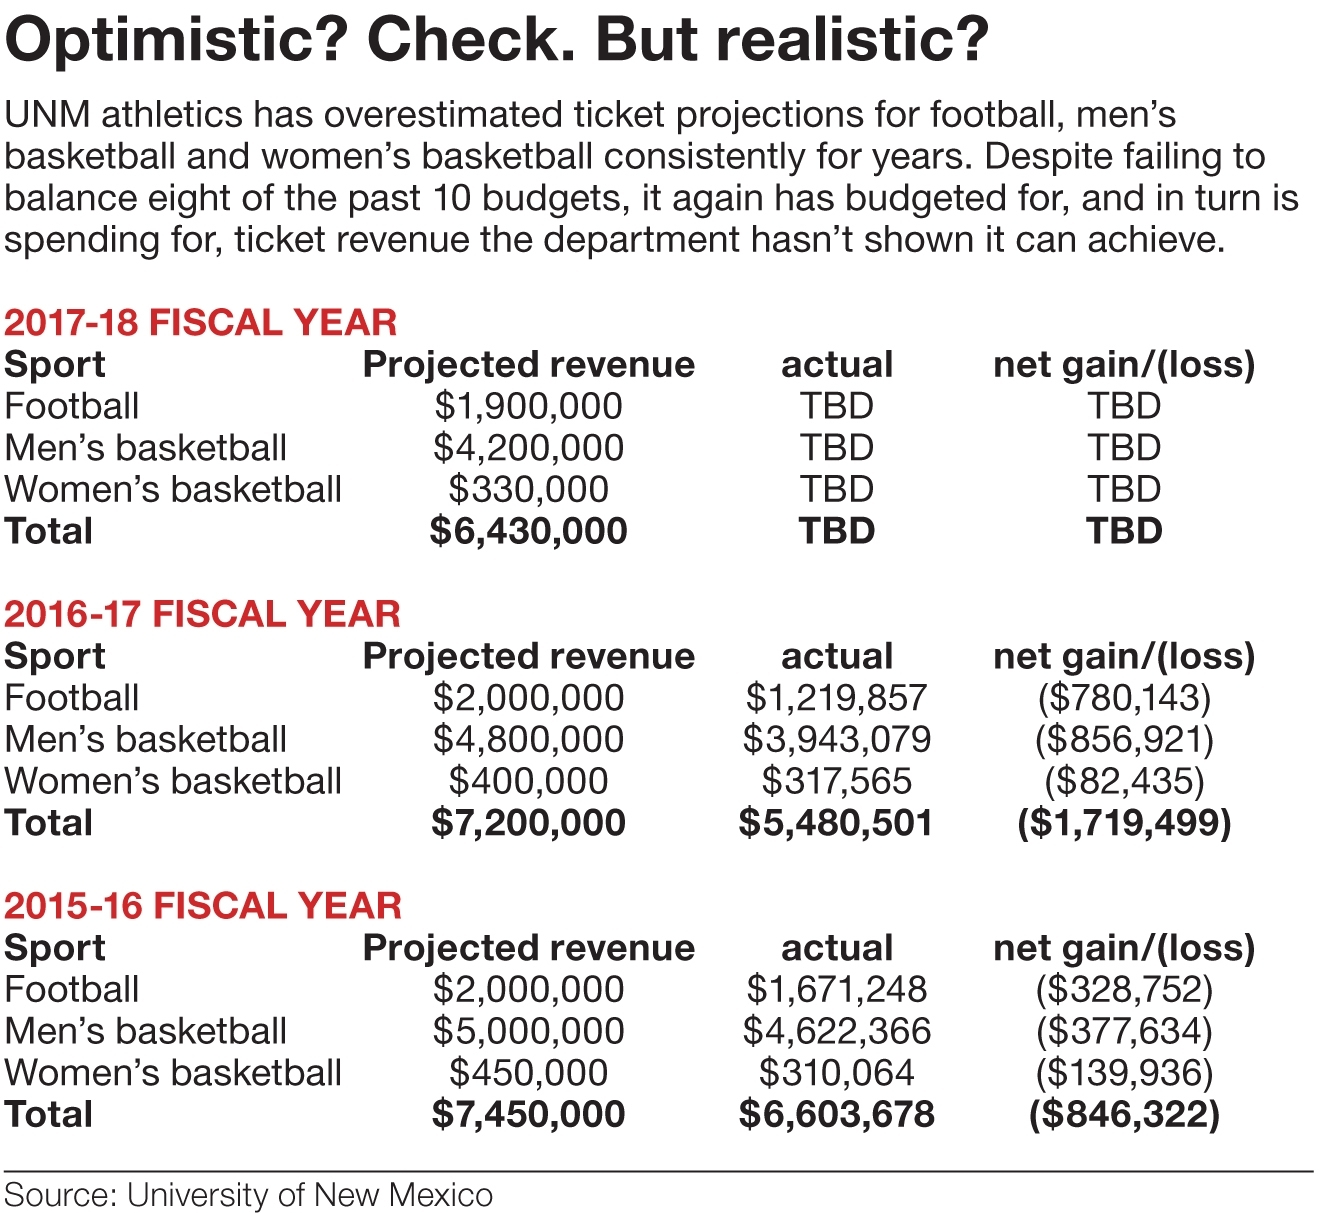 Unm Athletics Still Budgeting With Optimism Despite Track Record